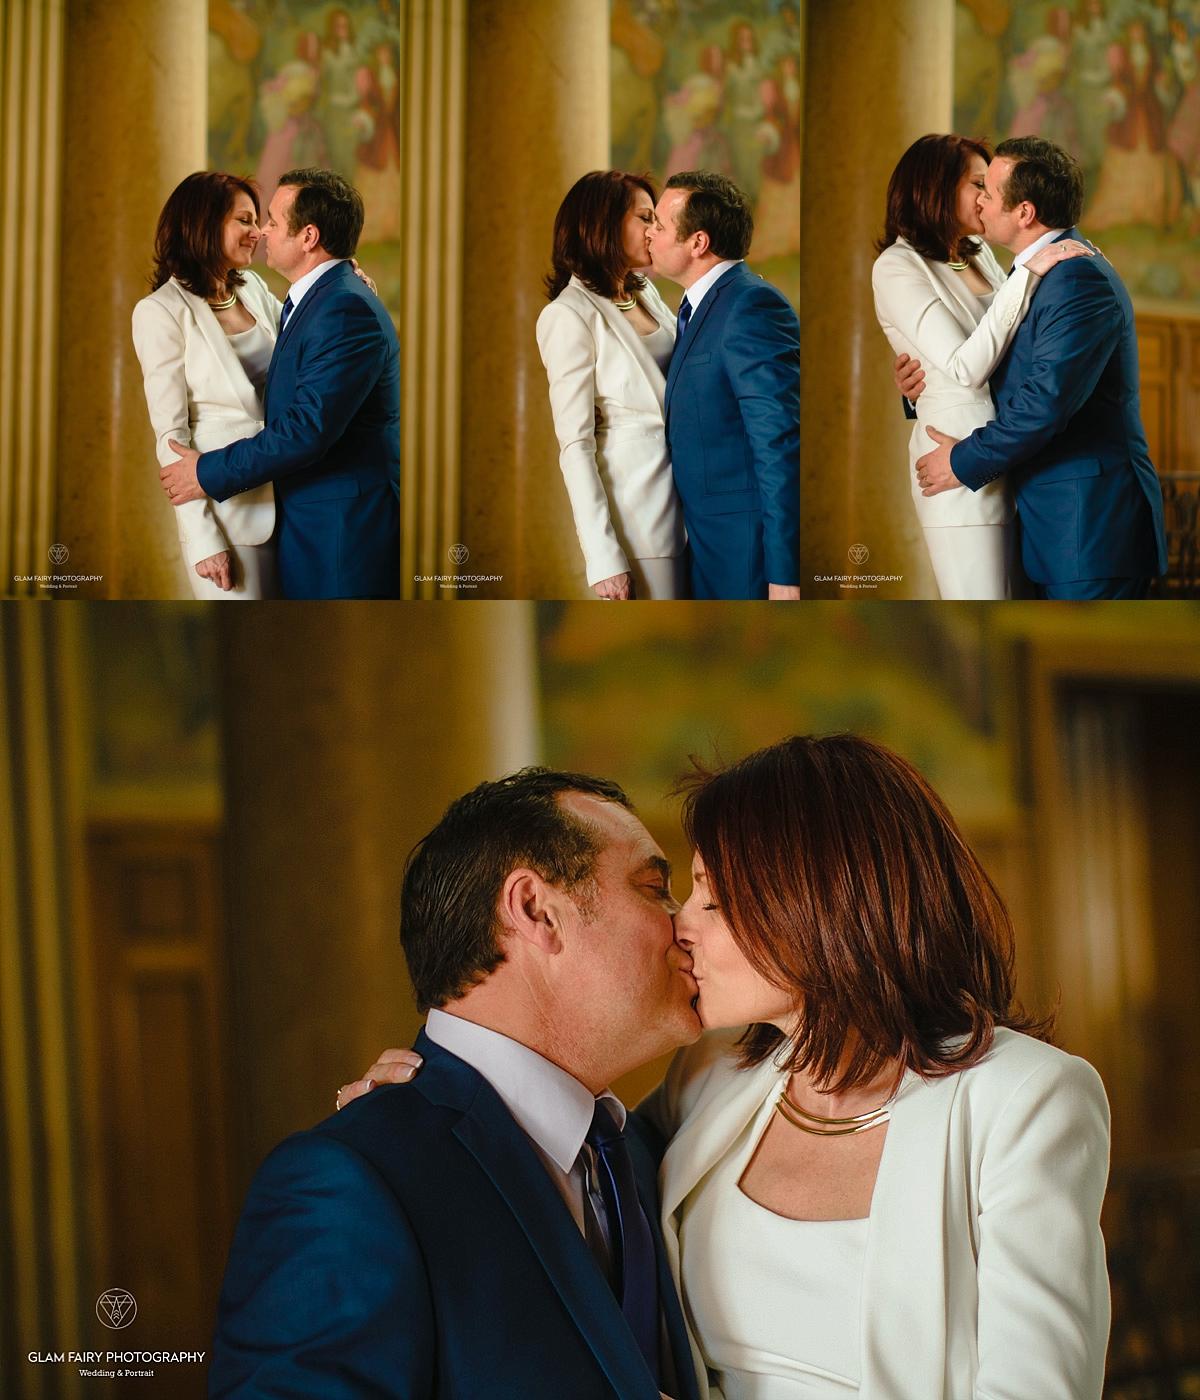 GlamFairyPhotography-mariage-civil-vincennes-patricia_0020